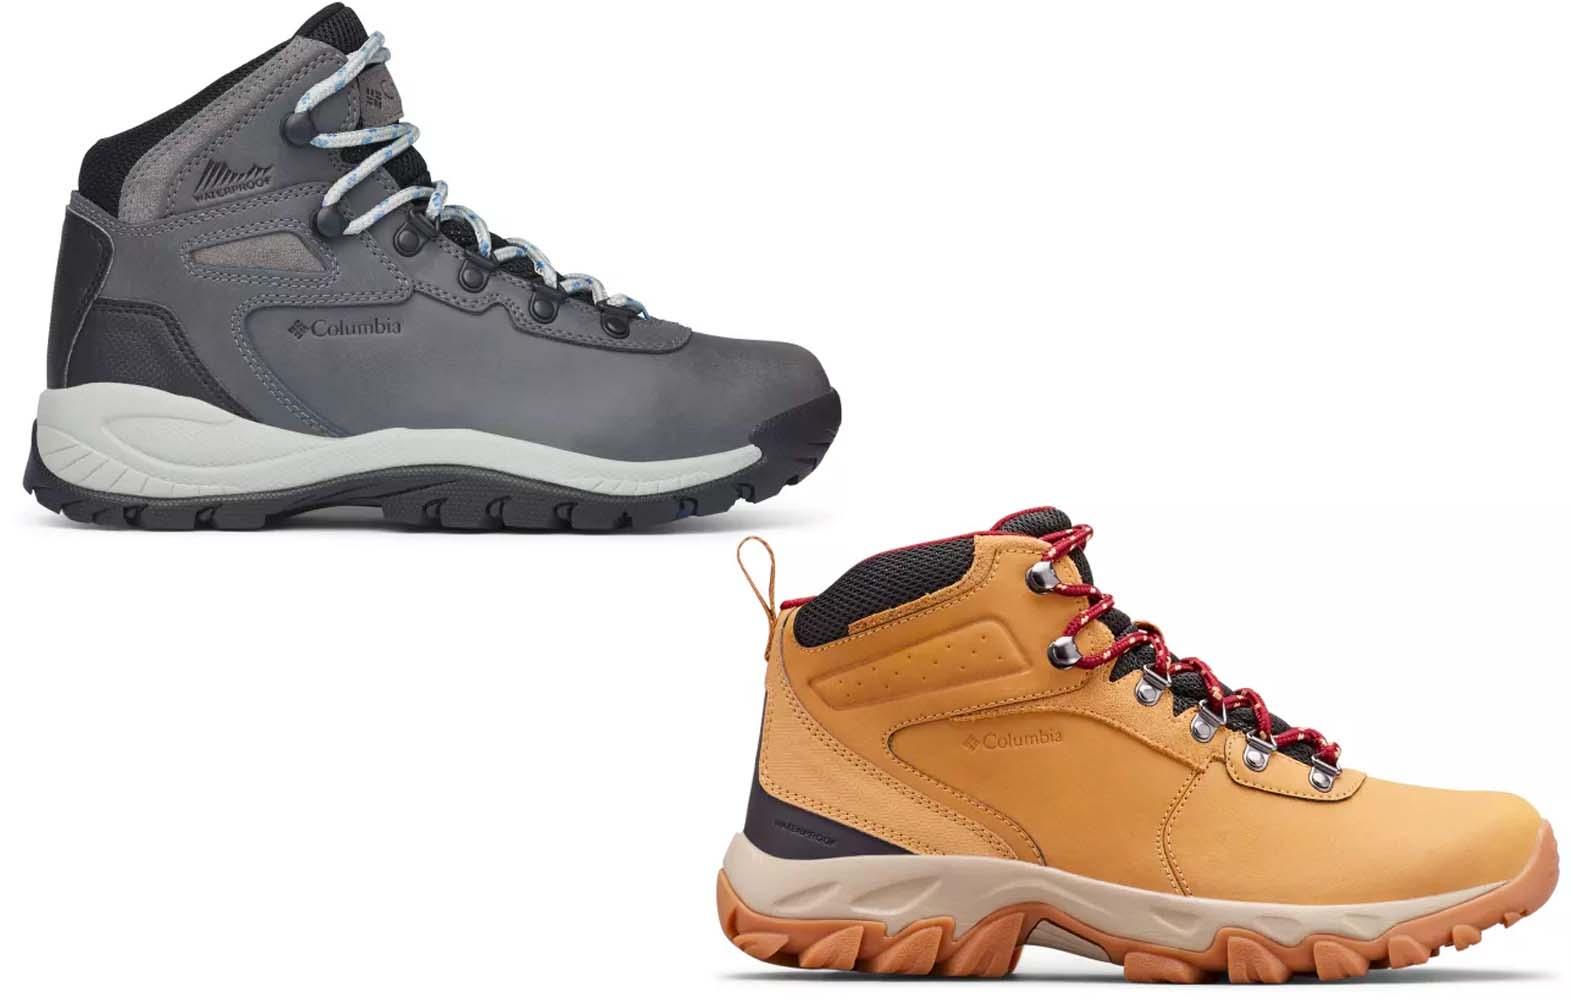 Columbia Newton Ridge hiking shoe